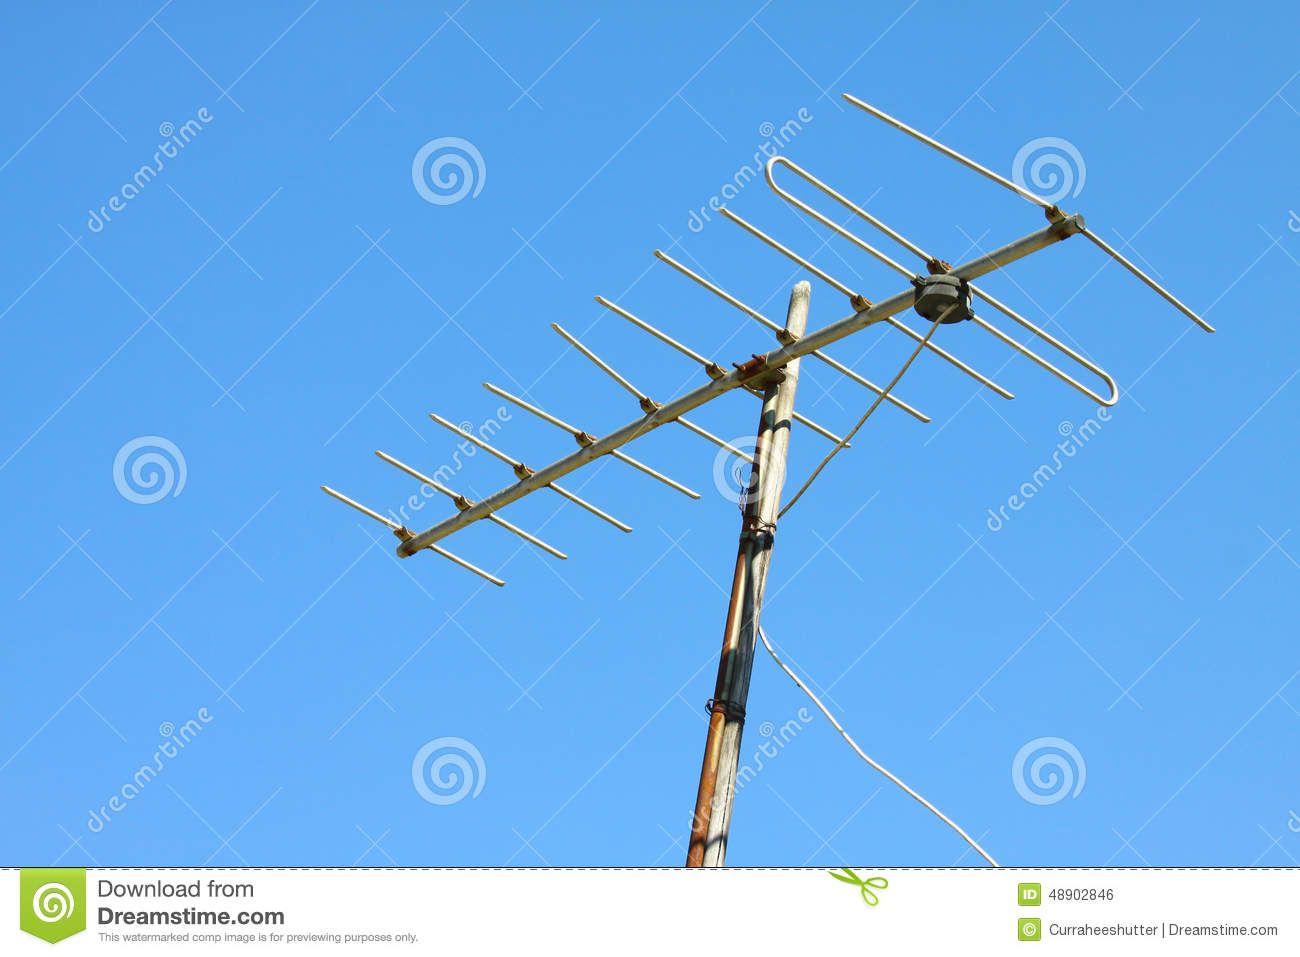 old-tv-antenna-house-roof-blue-sky-48902846.jpg 1,300×957 pixels